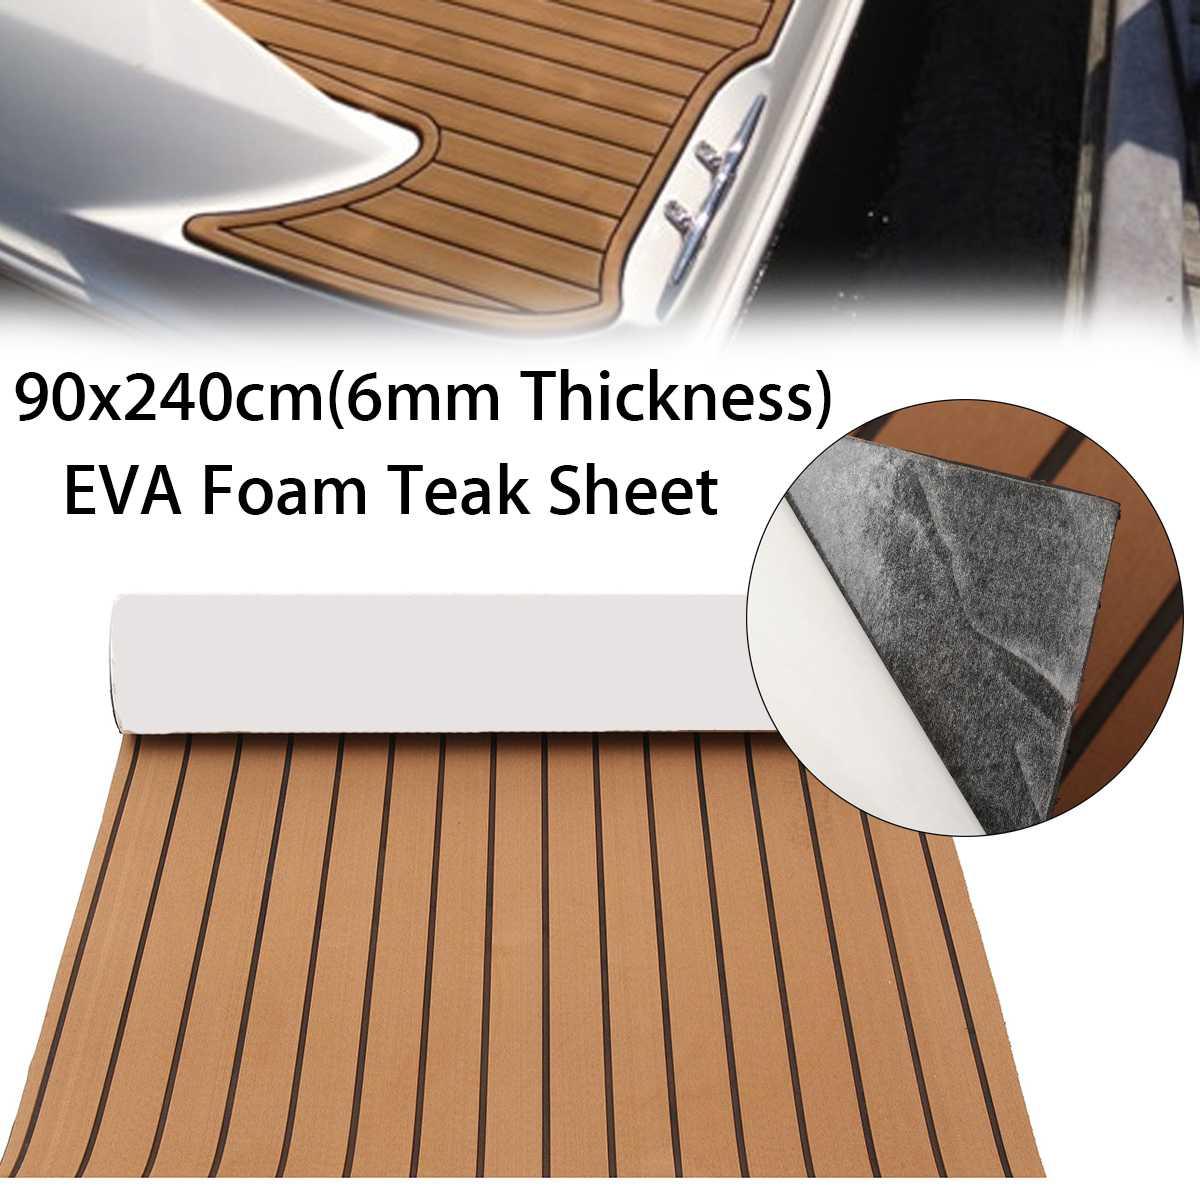 240x90cm EVA Foam Teak Sheet Boat RV Yacht Synthetic Teak Decking Marine Boat Flooring Yacht Teak Decking Sheet Carpet Floor Pad(China)